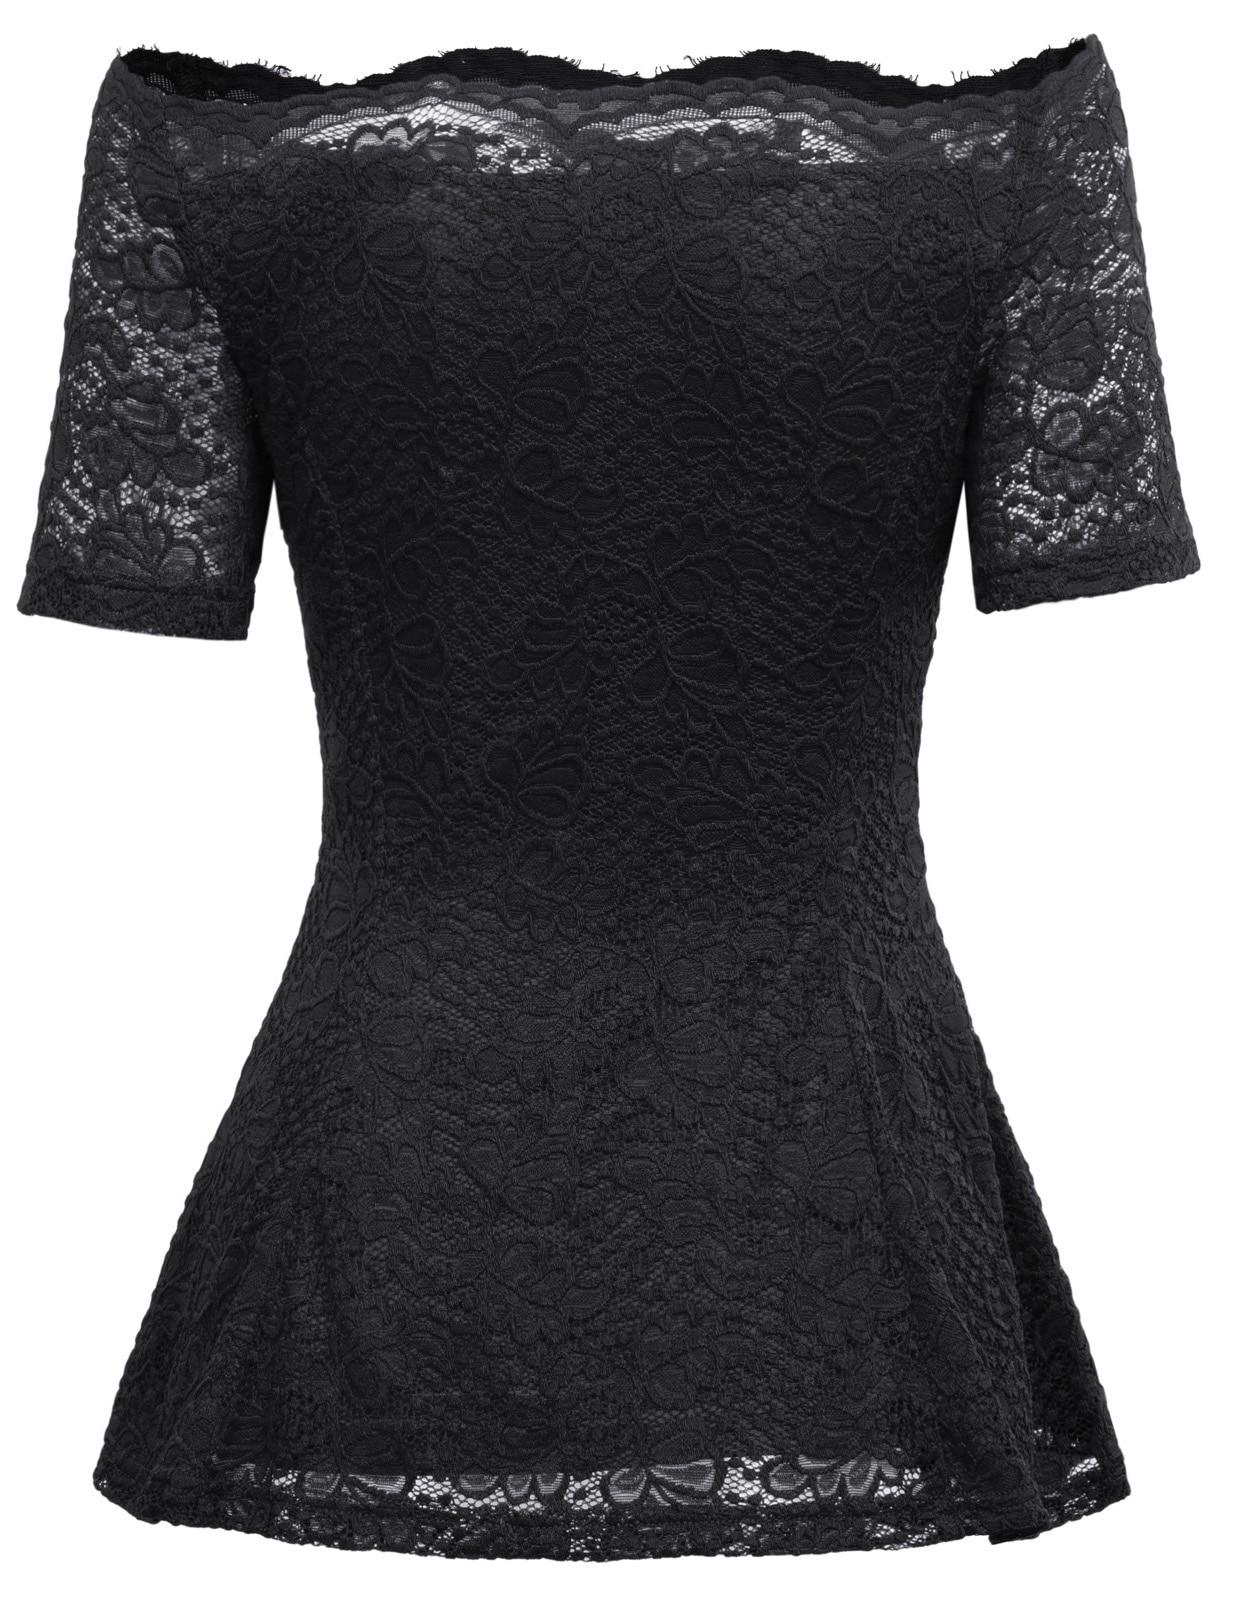 Sexy elegant Women slash neck Off Shoulder short sleeve Floral Lace shirt black and wine blouses 2018 summer tops